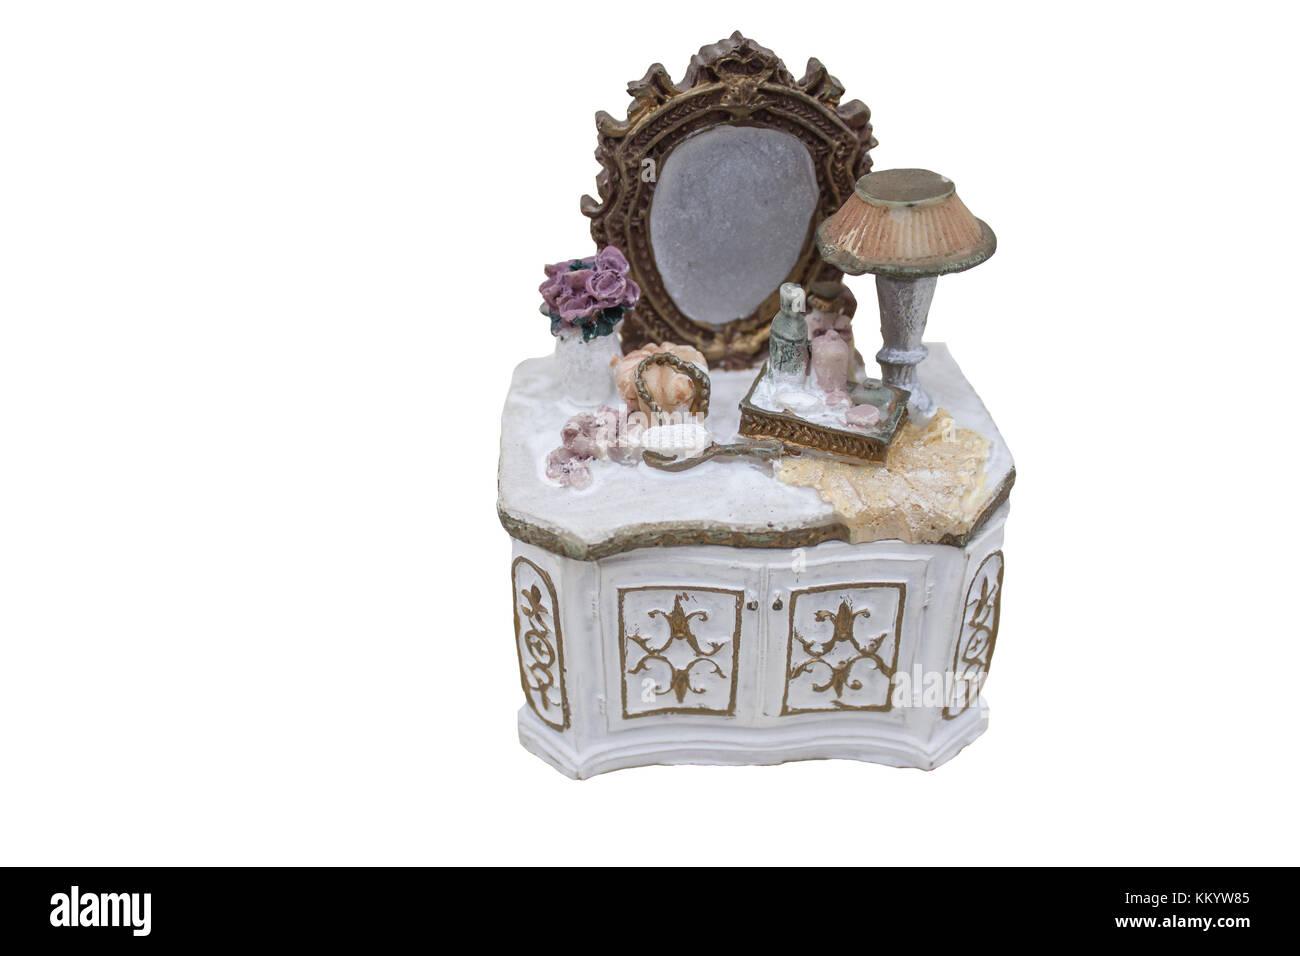 Souvenir box for storing various small things - Stock Image